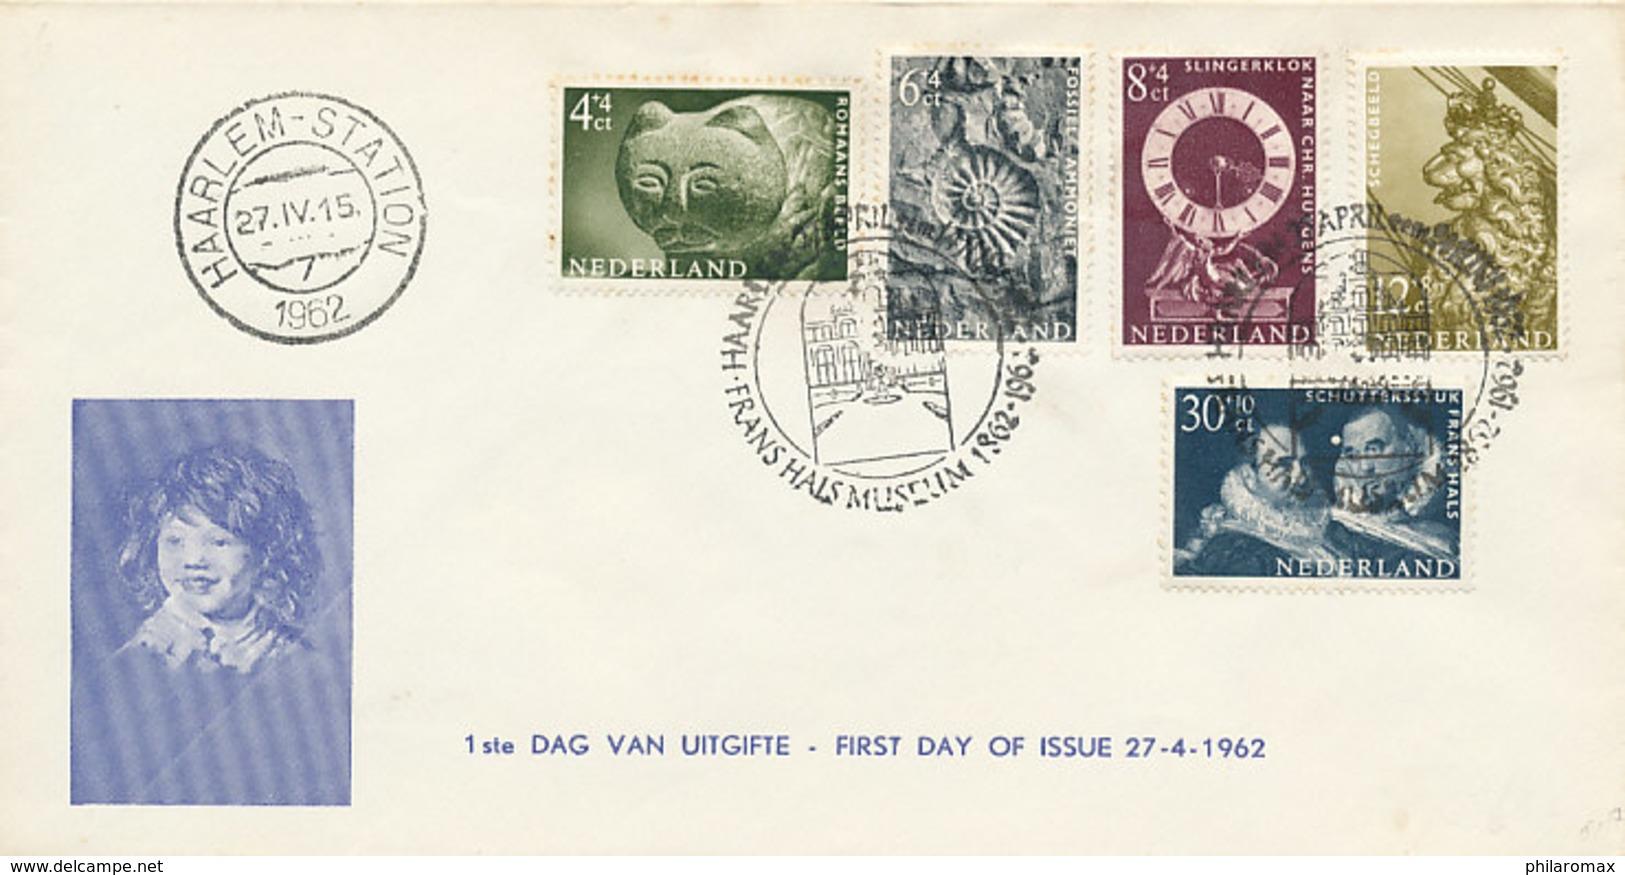 DC-0802 - 1962 NETHERLANDS - FDC ZOMERZEGELS FRANS HALS MUSEUM HAARLEM - STEMPEL FRANS HALS MUSEUM - FDC